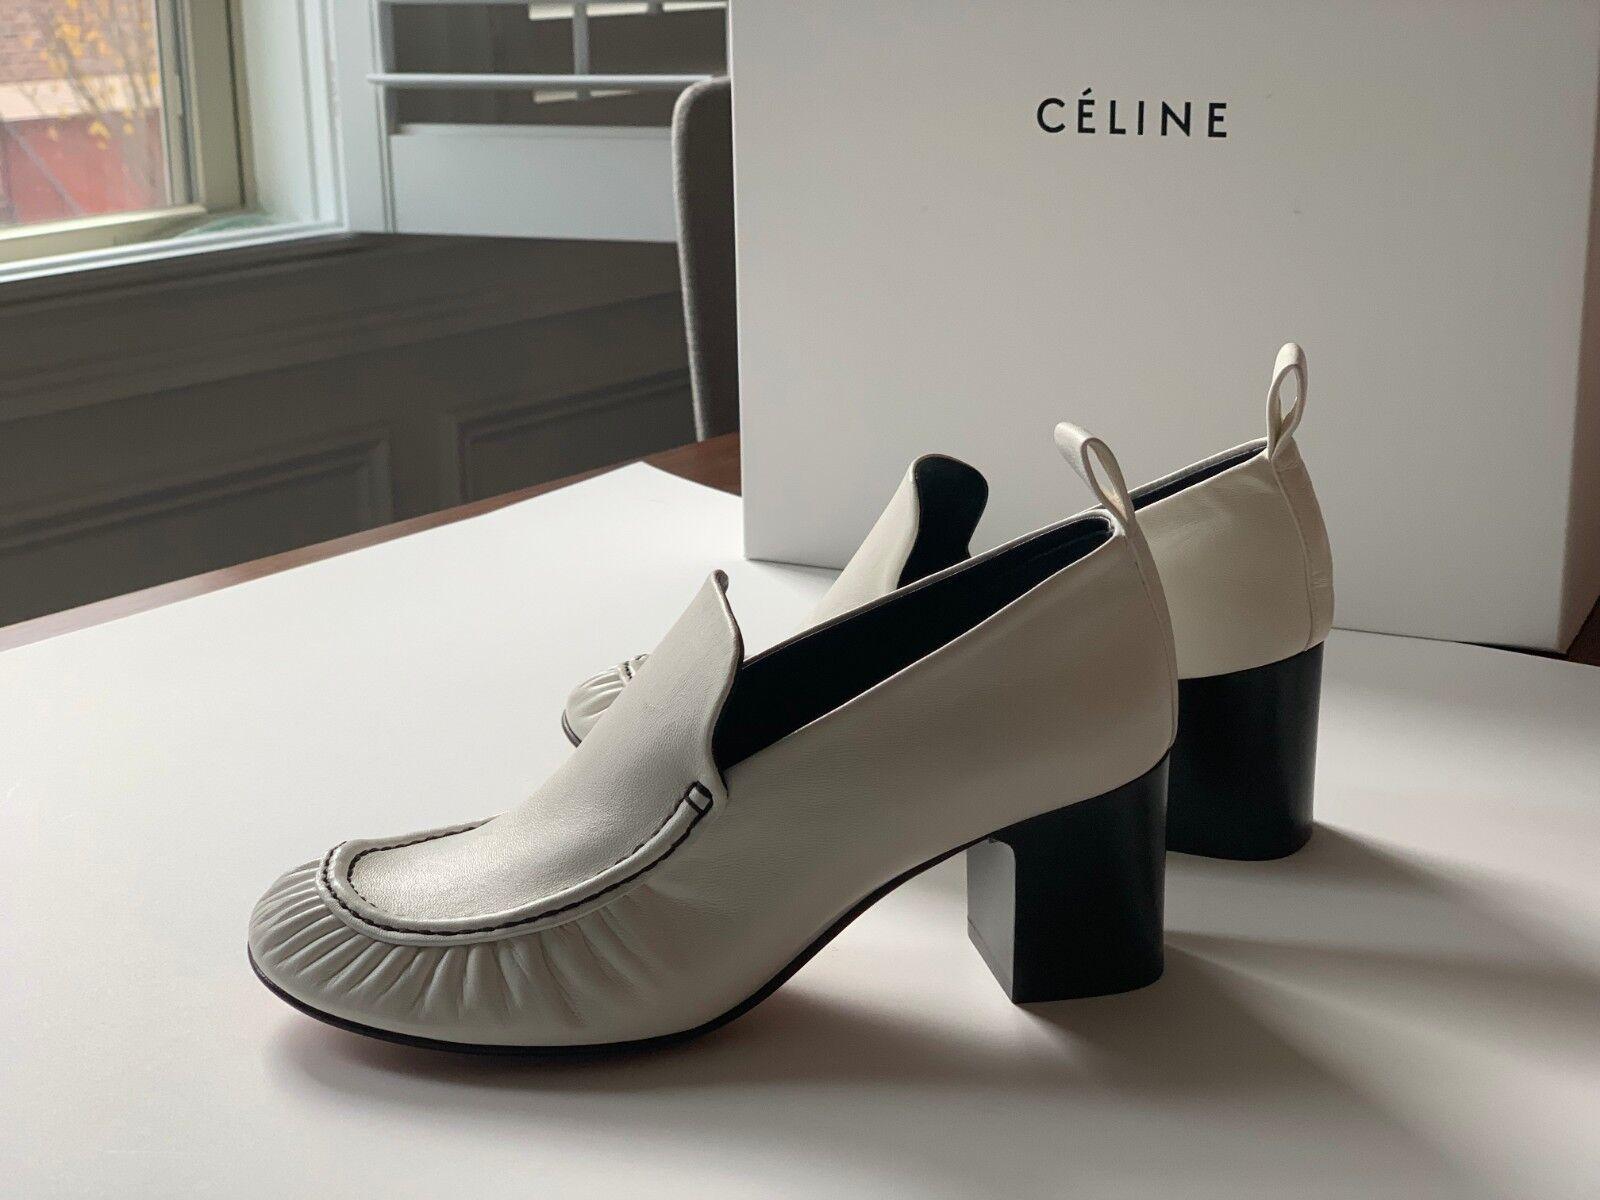 Céline Tubular Mocc Napa cordero-Talla 7.5 - en blancoo